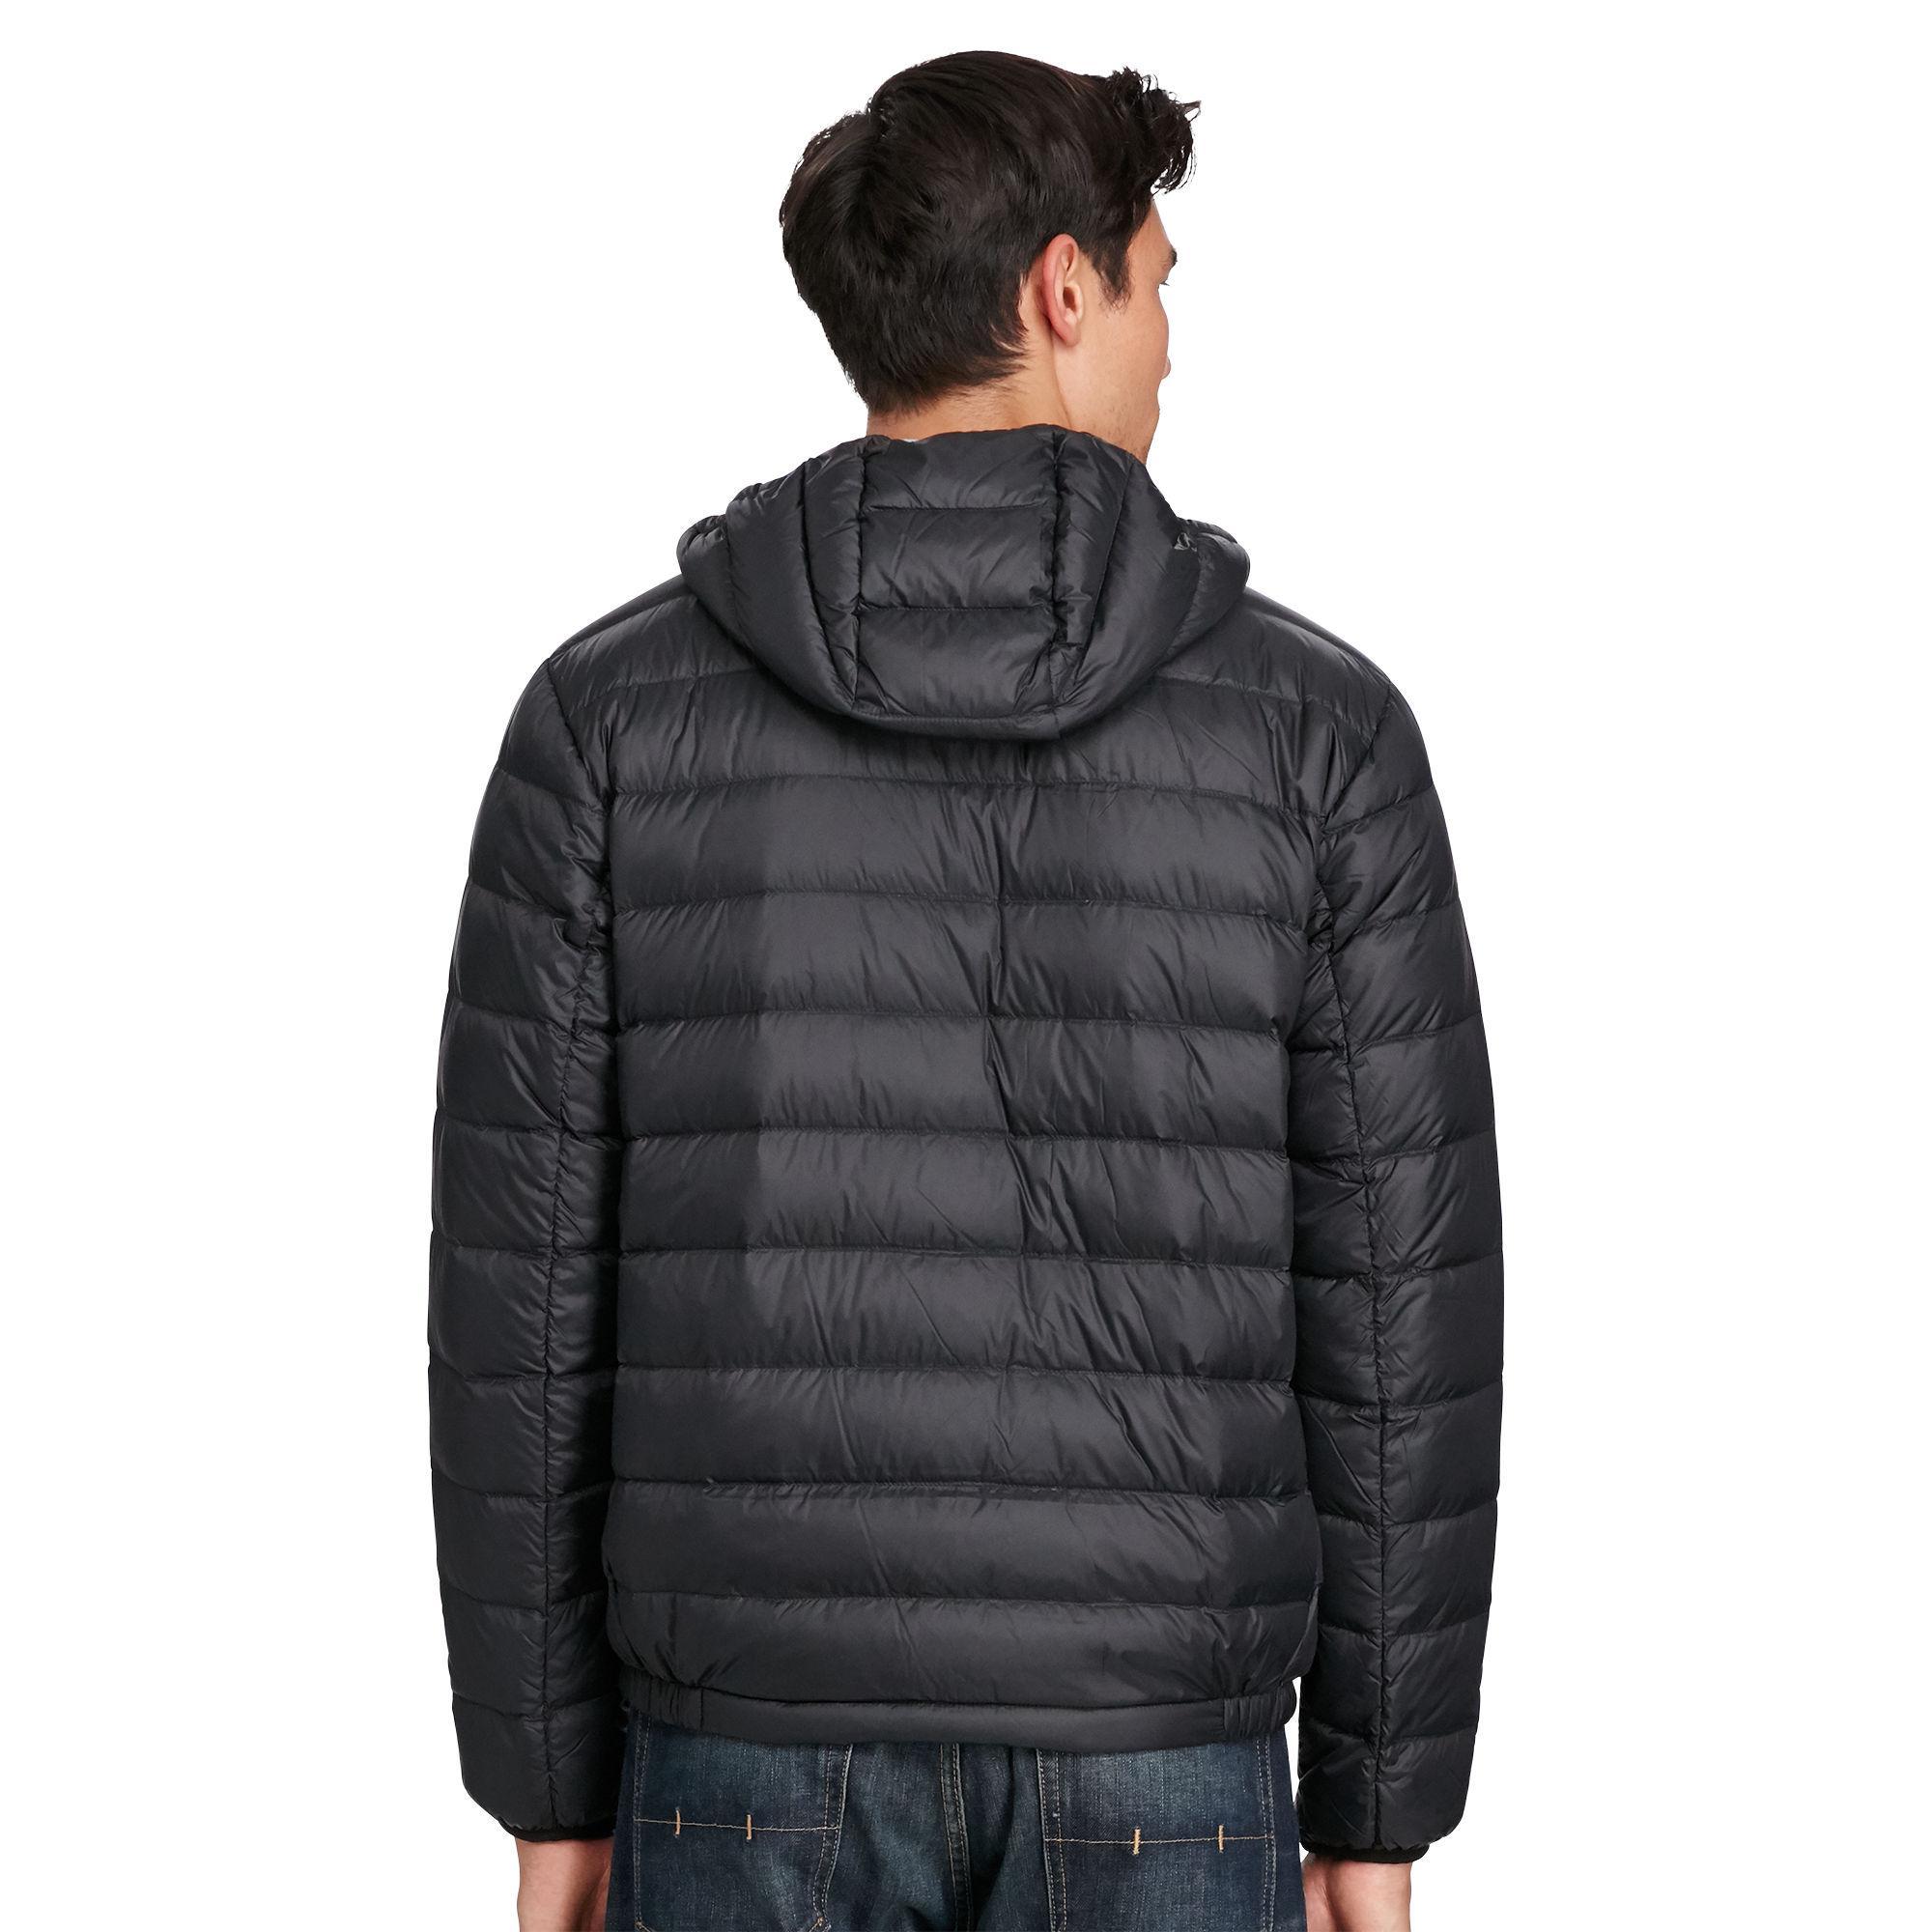 Polo ralph lauren Packable Down Jacket for Men | Lyst